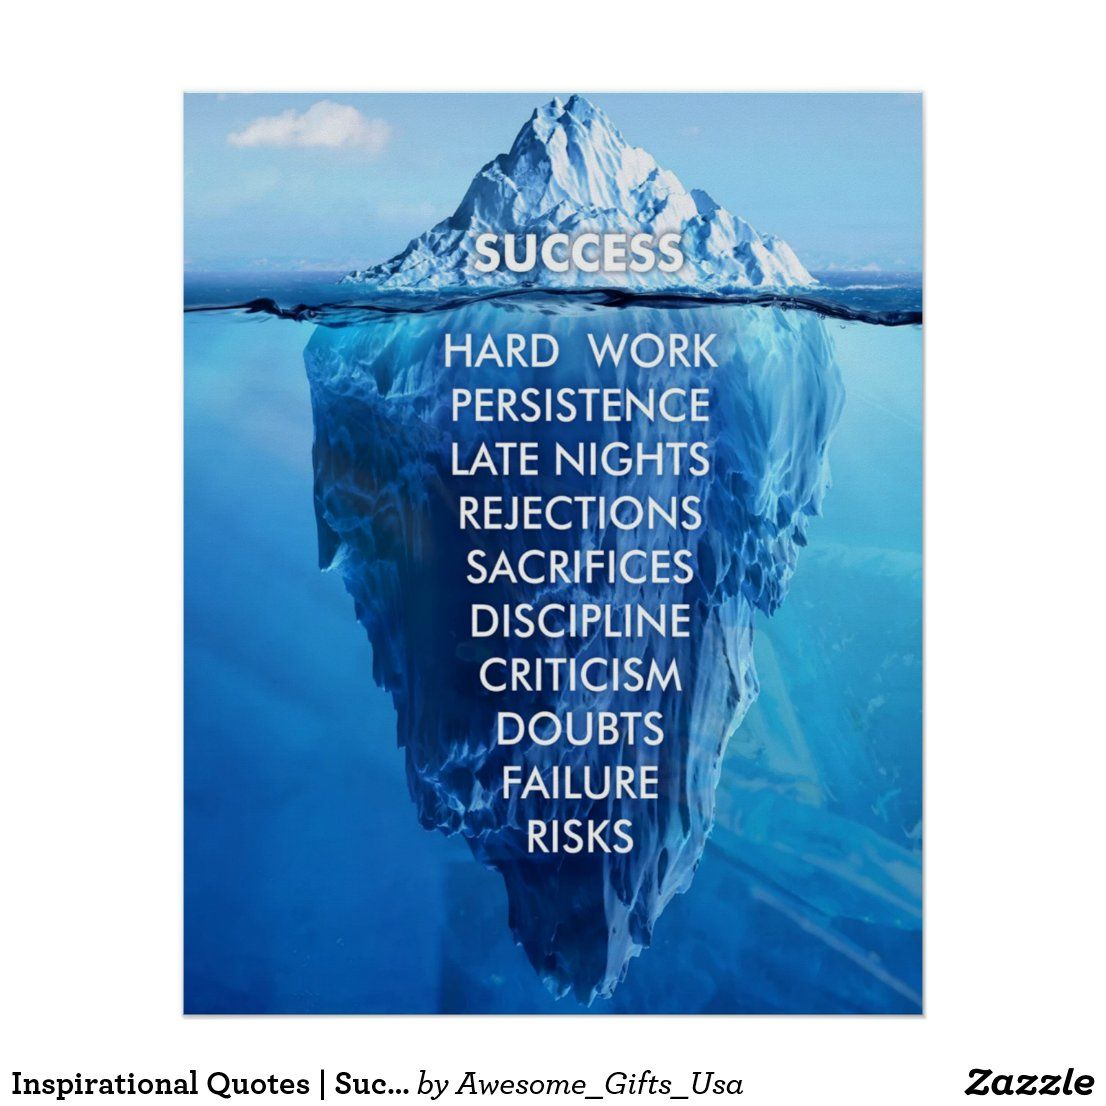 inspirational quotes success iceberg